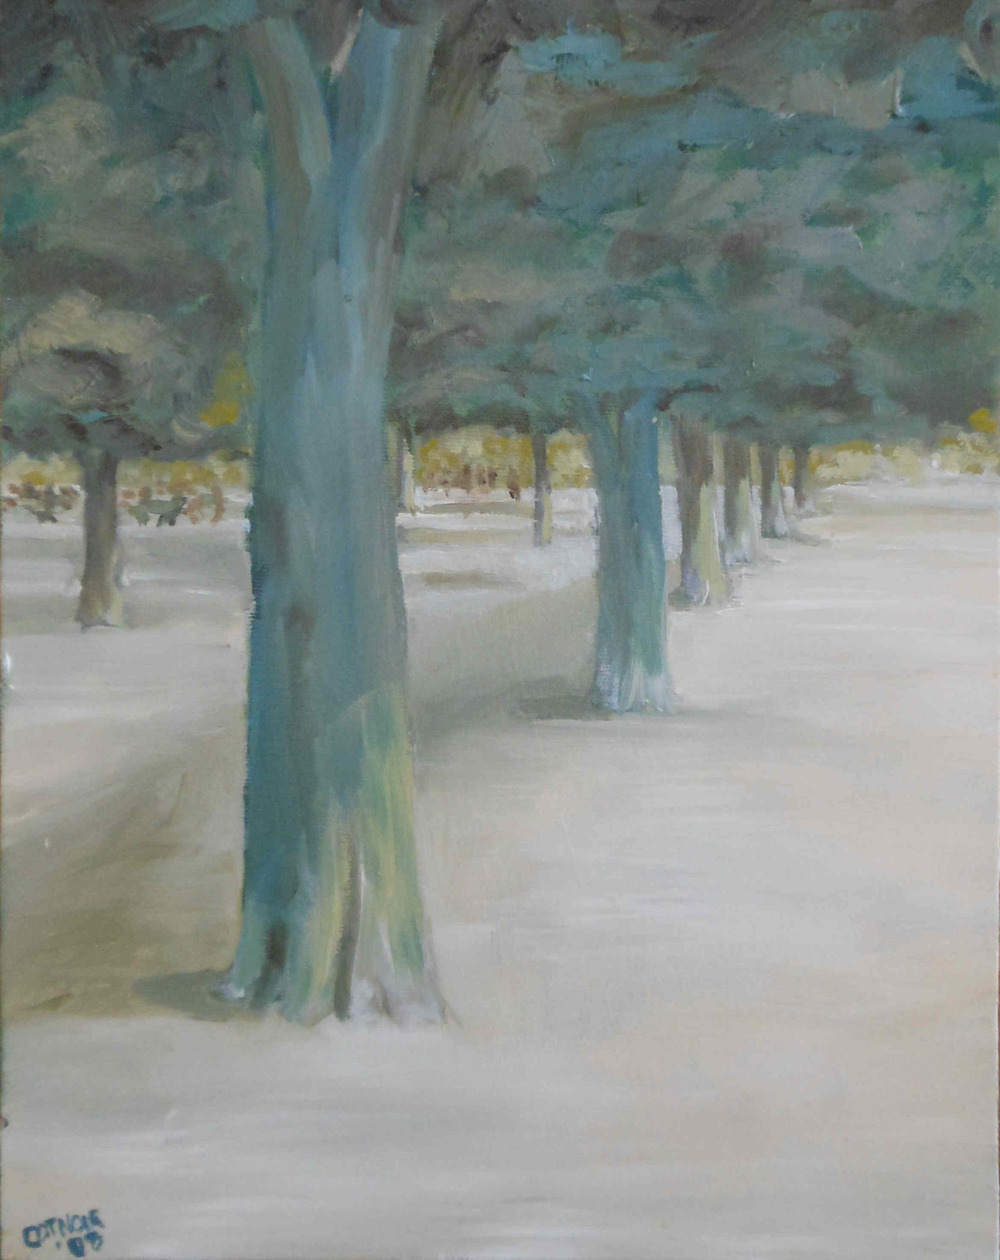 Jardin des Tuilleries-14x11, oil on canvasjpg.jpg